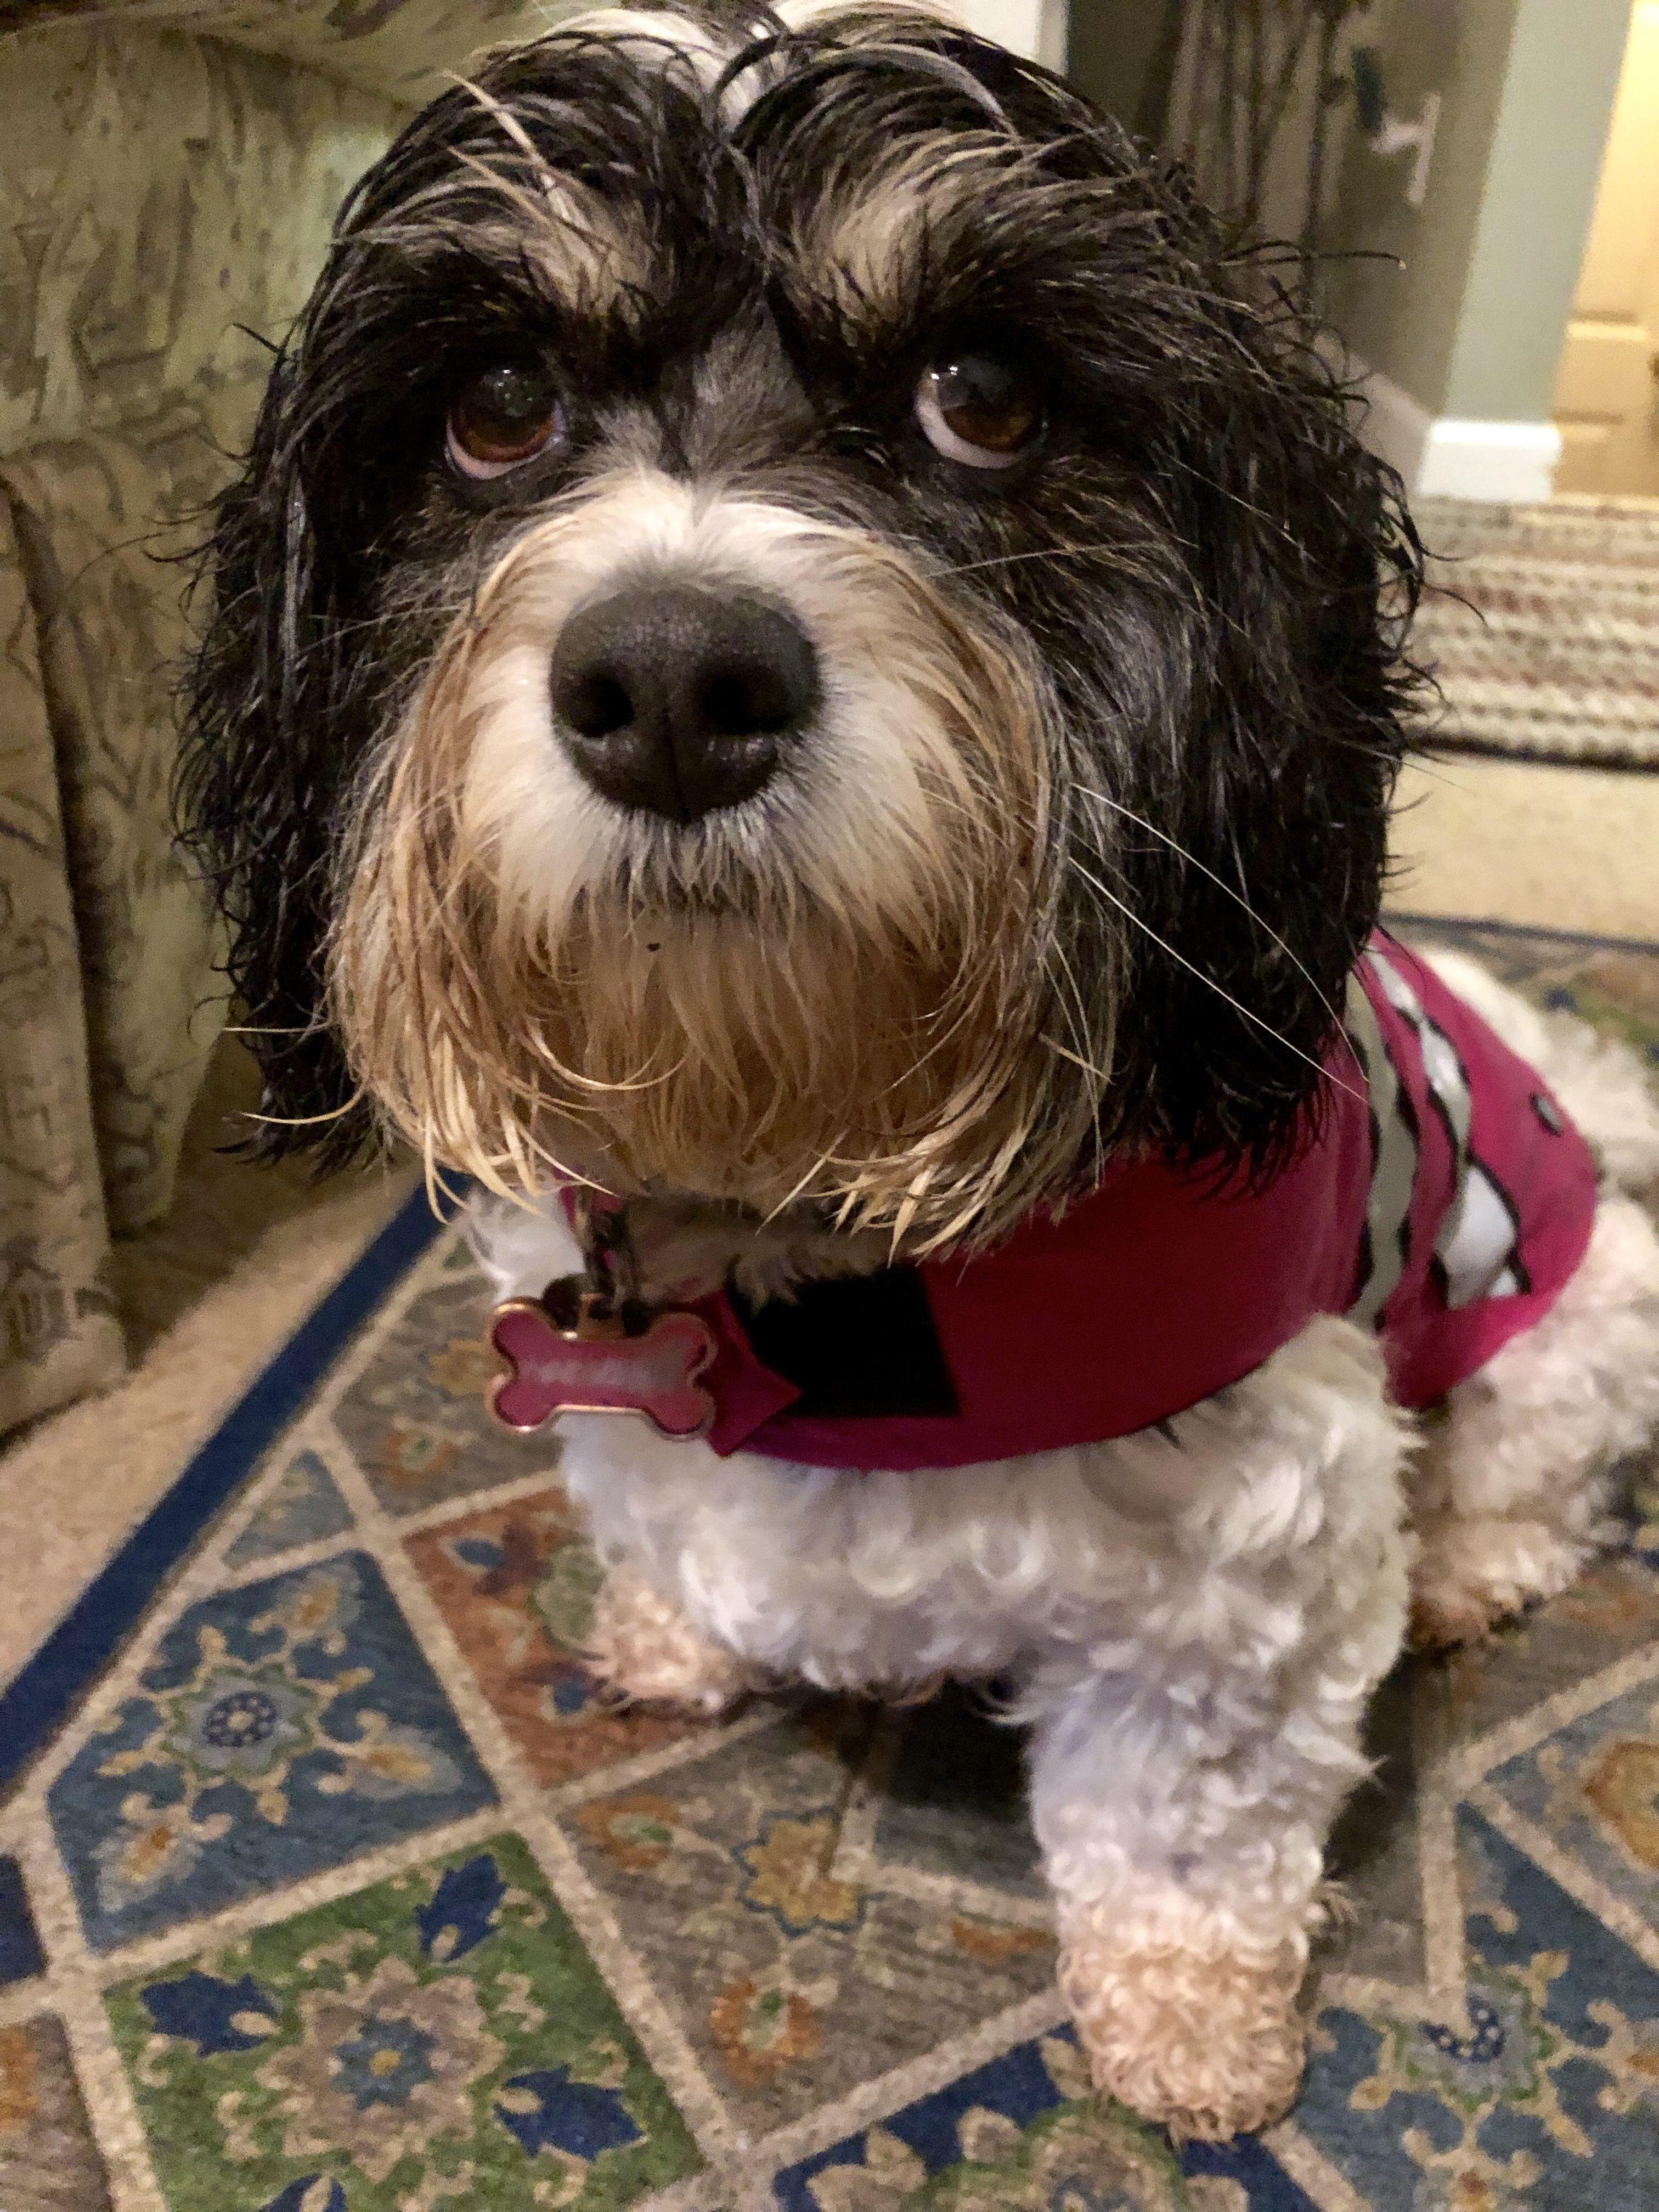 Pin By Tammy Mcbrien On Cavachon Gemma Cavachon Dogs Animals